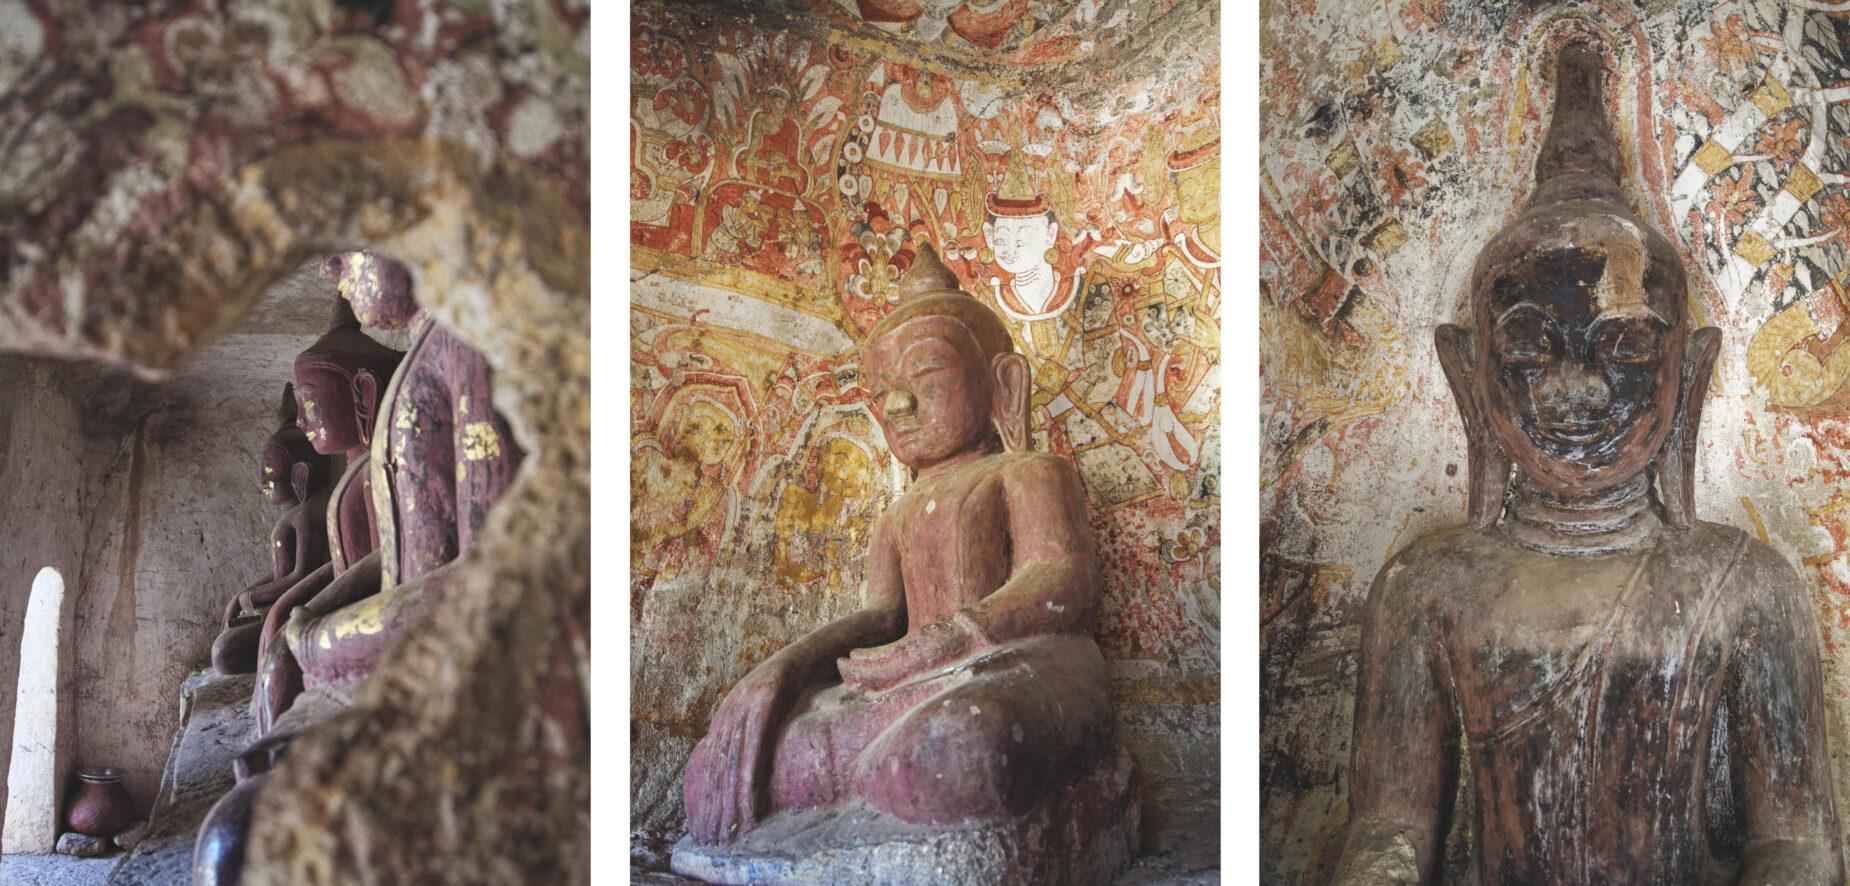 Po Win Taung : sculptures du Bouddha